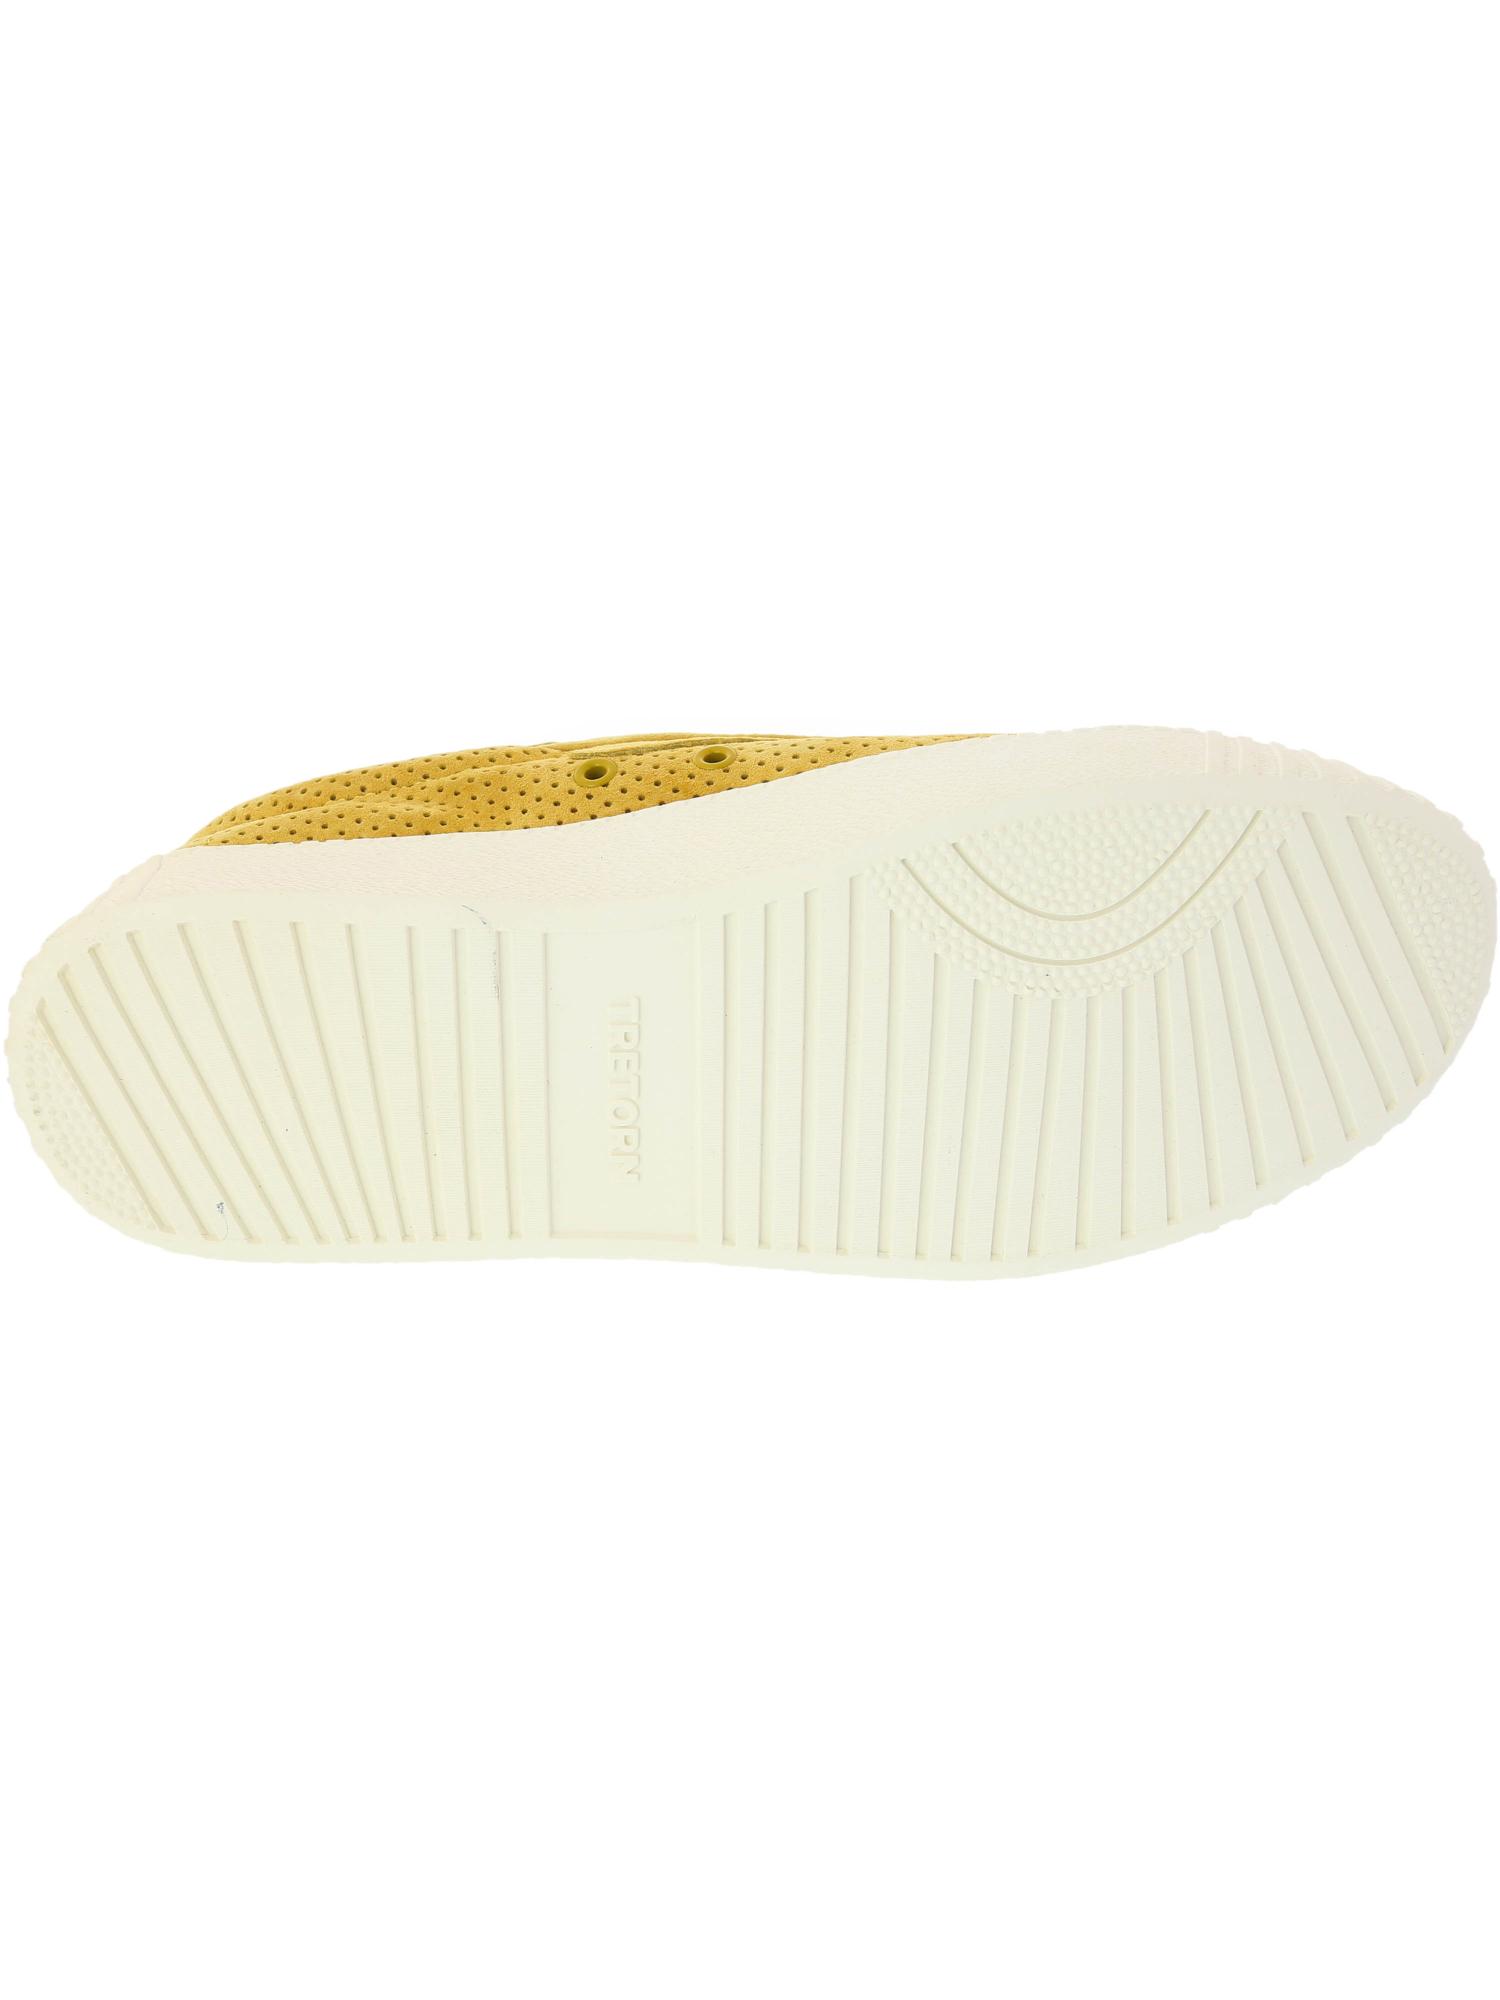 Tretorn-Nylite-3-Bold-Suede-Fashion-Sneaker thumbnail 23